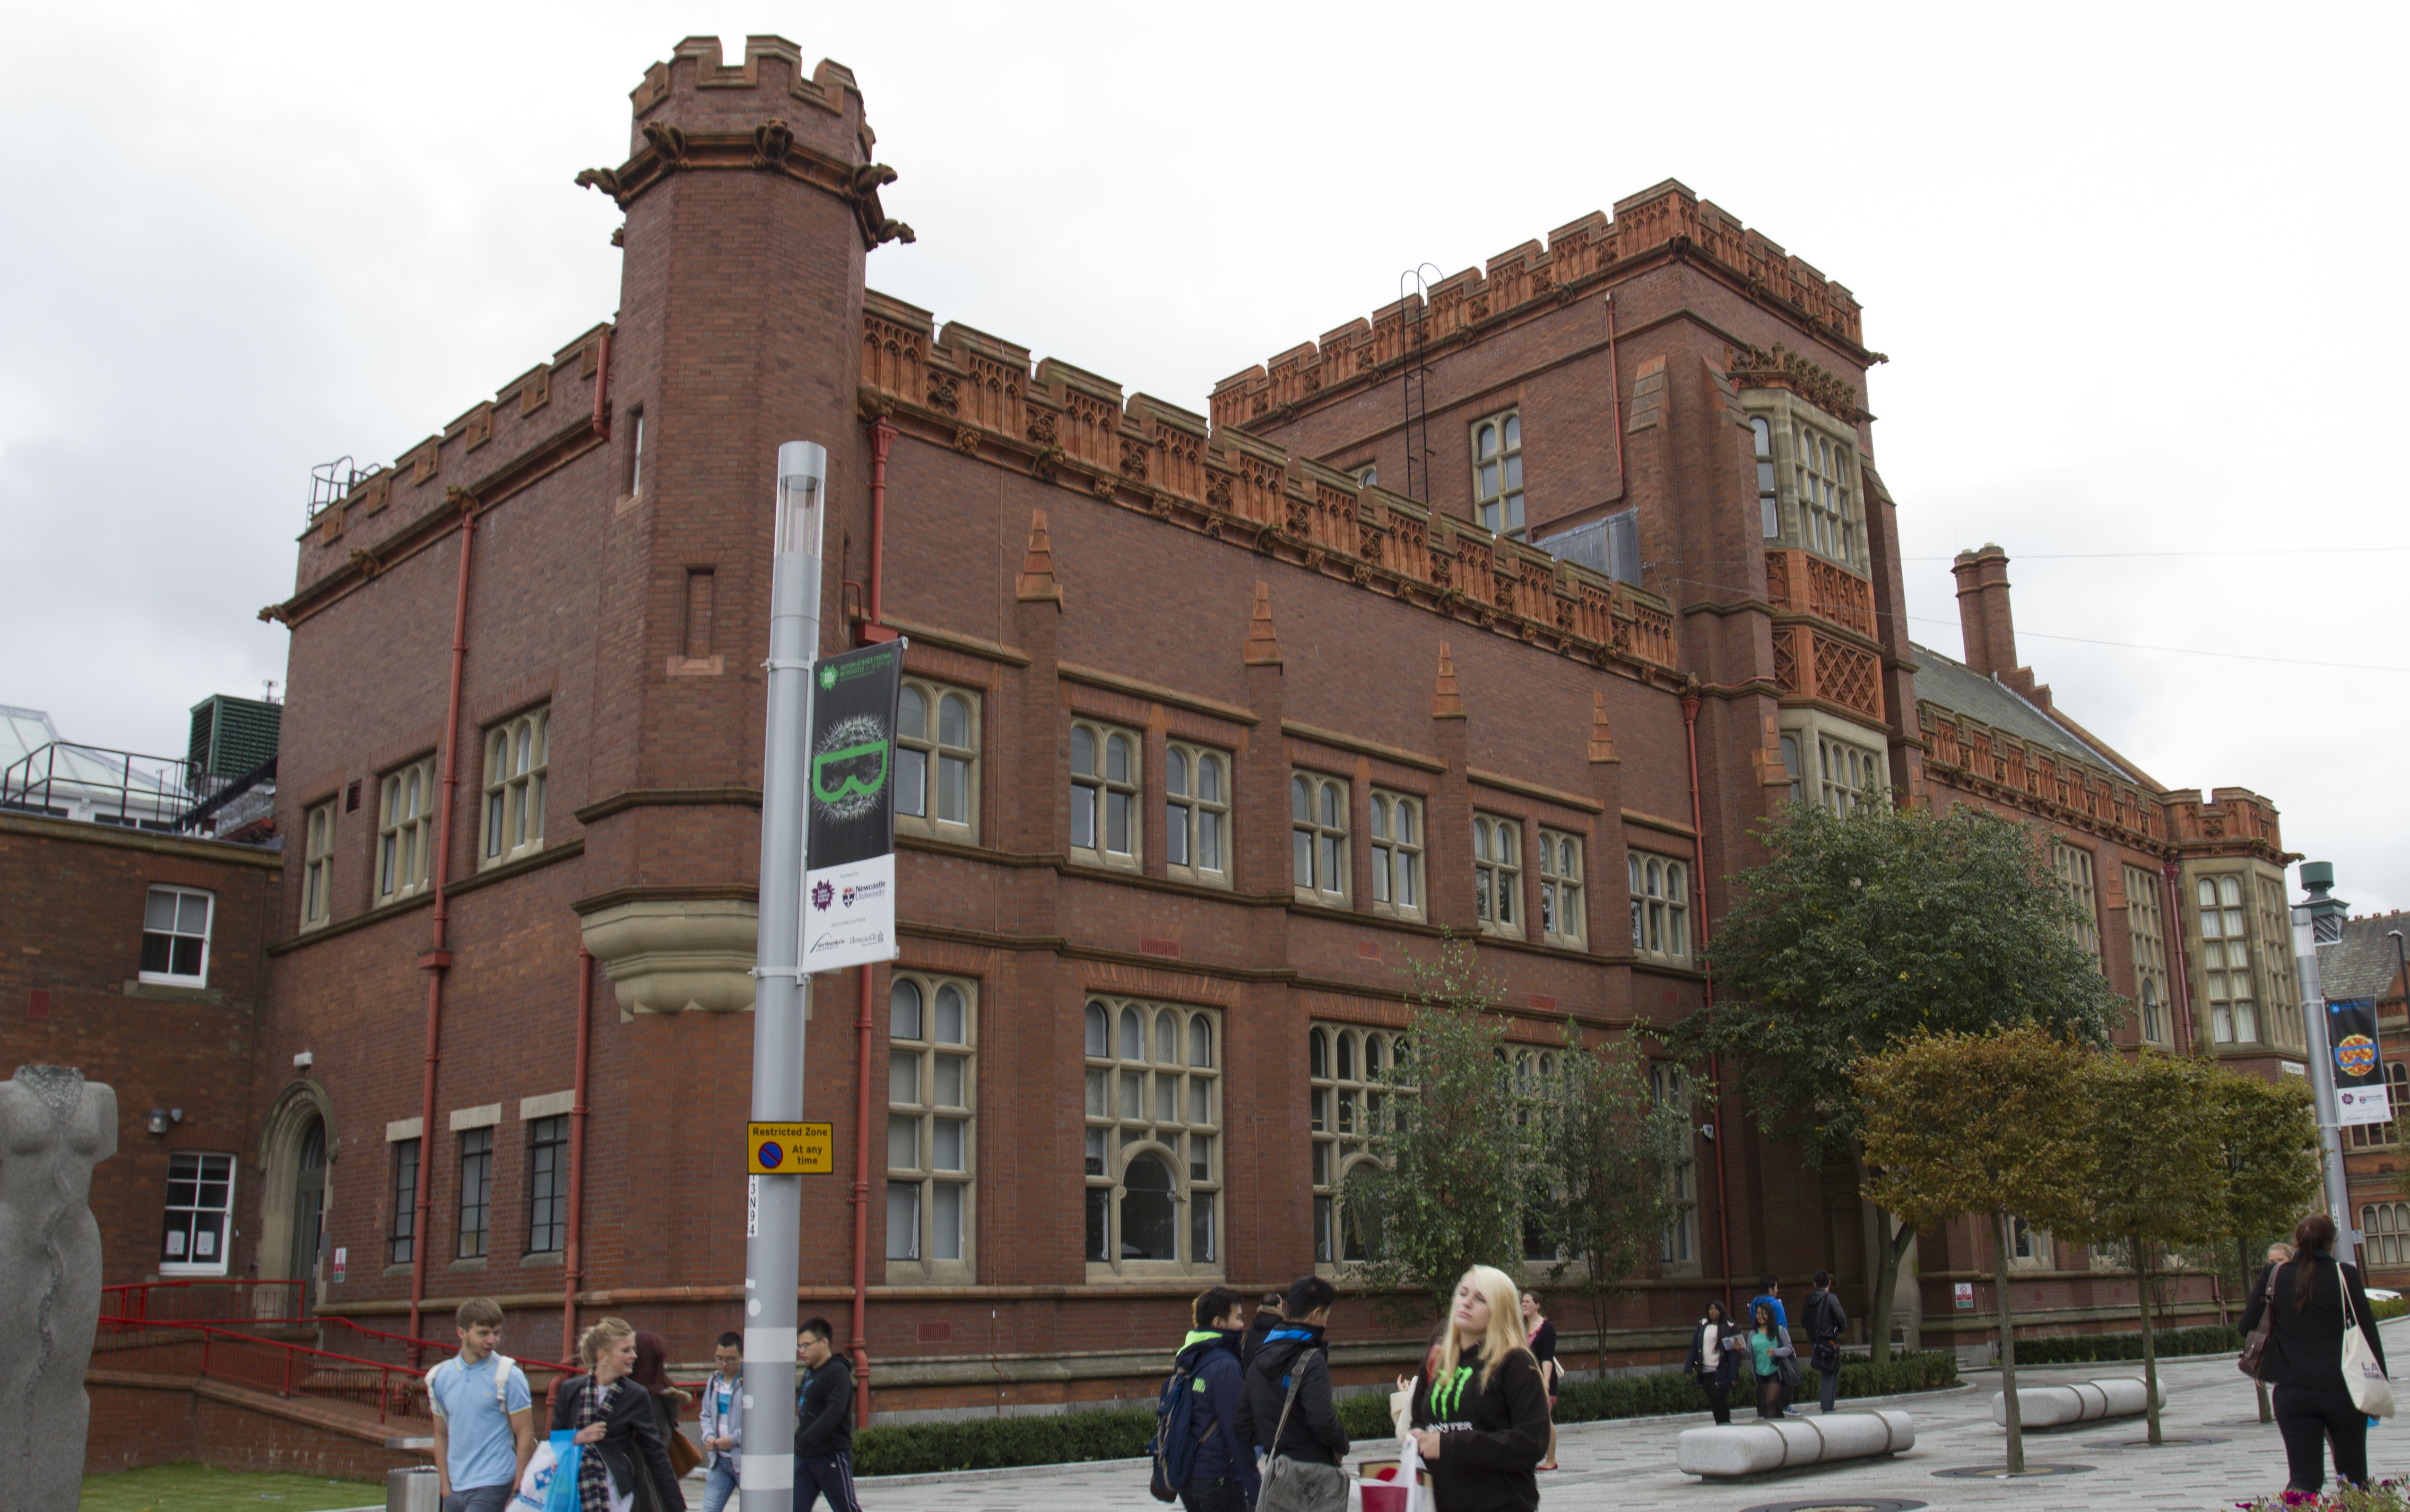 Sutherland Building Northumbria University Postcode